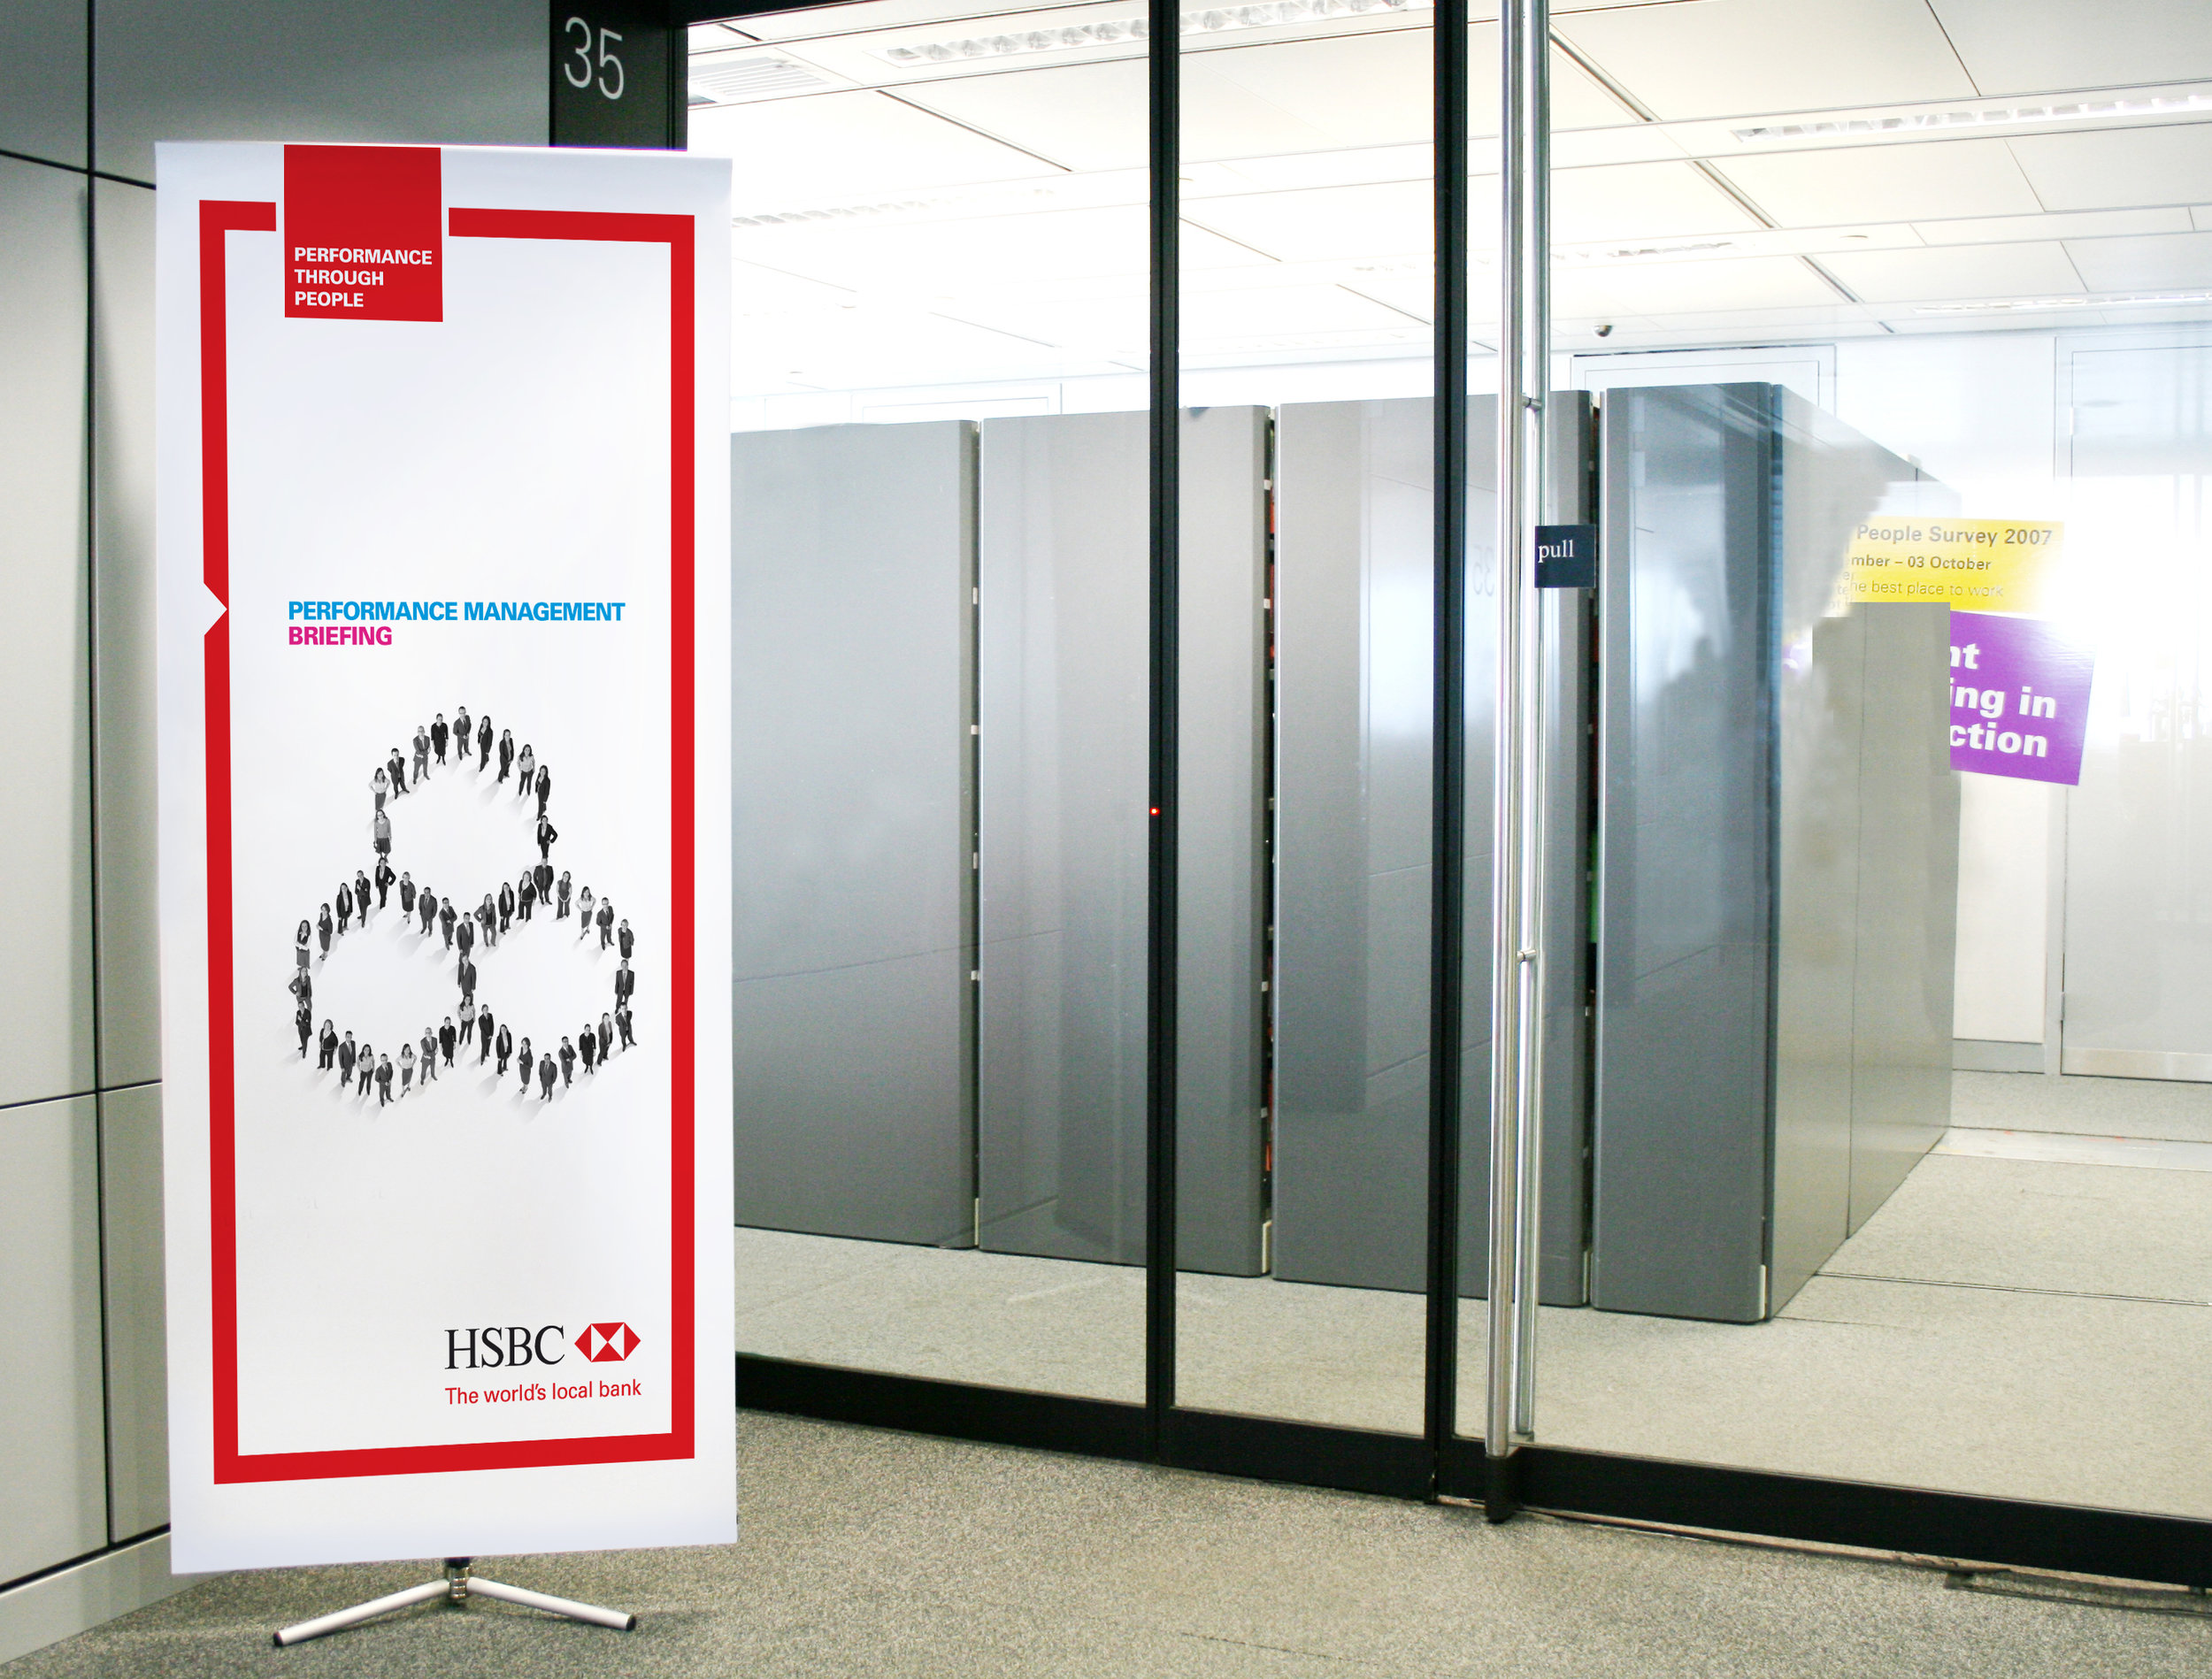 HSBC_pullup copy.jpg